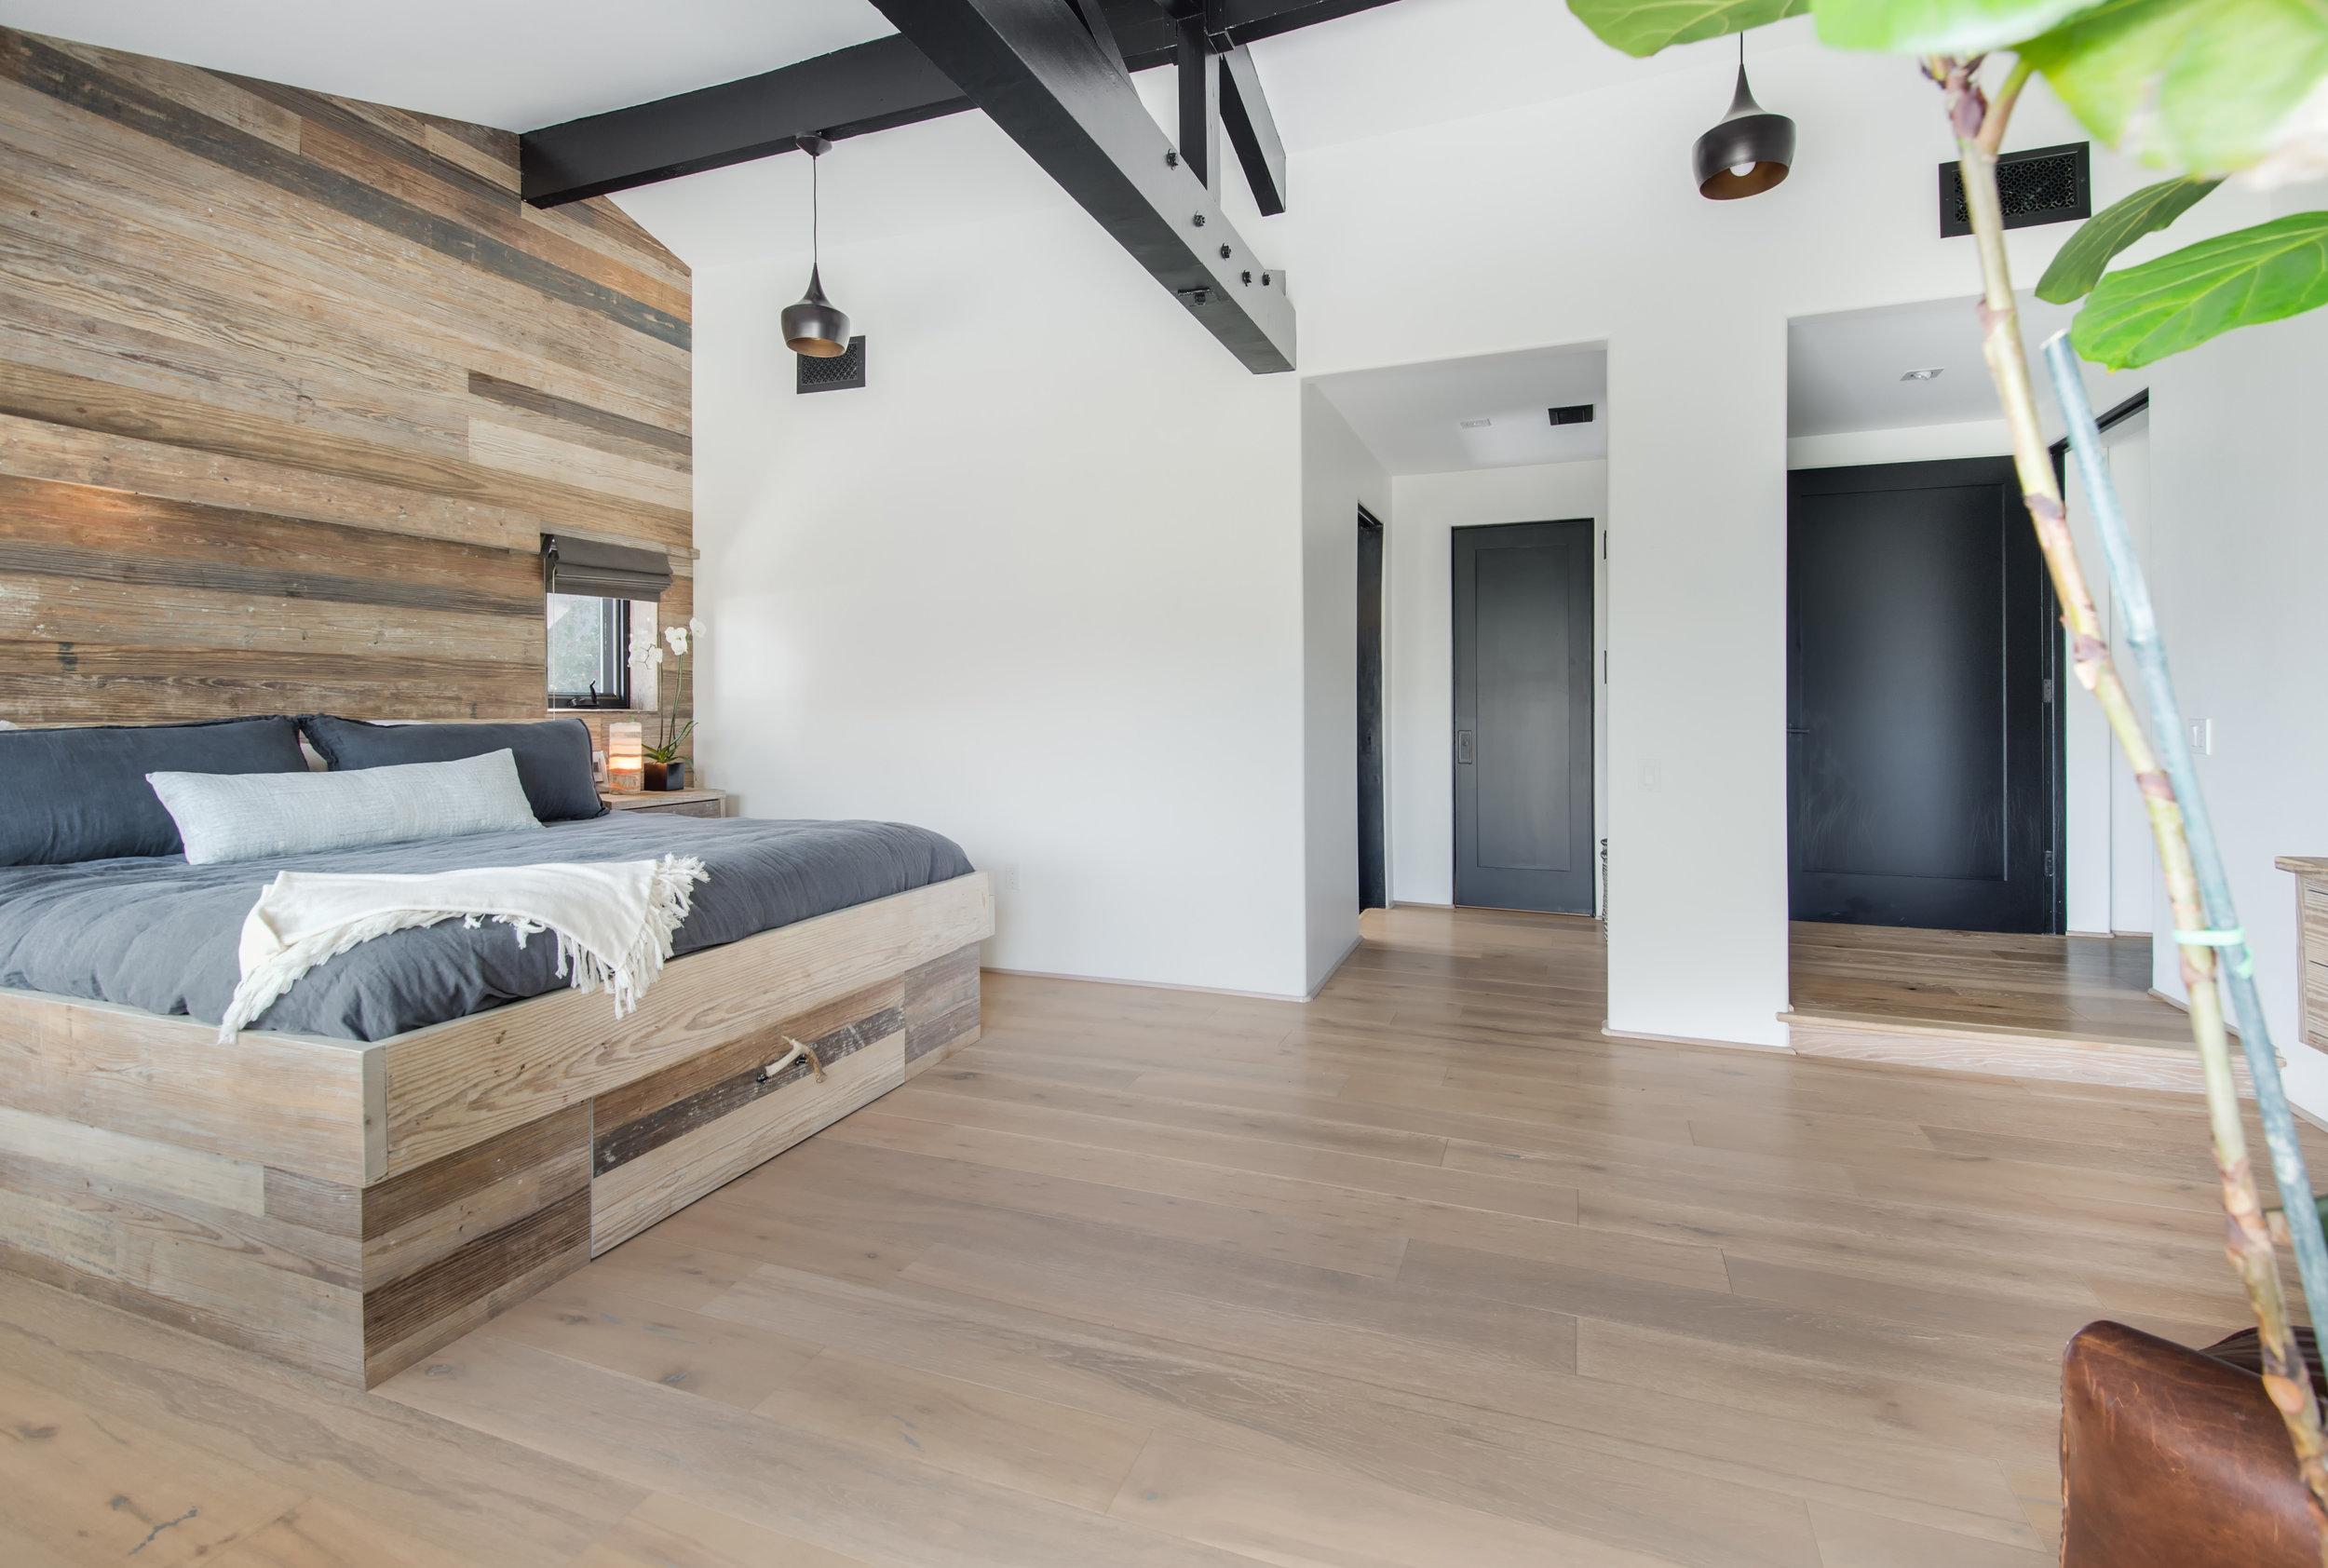 019 Master Bedroom 26272 Cool Glen Way Malibu For Sale Luxury Real Estate.jpg